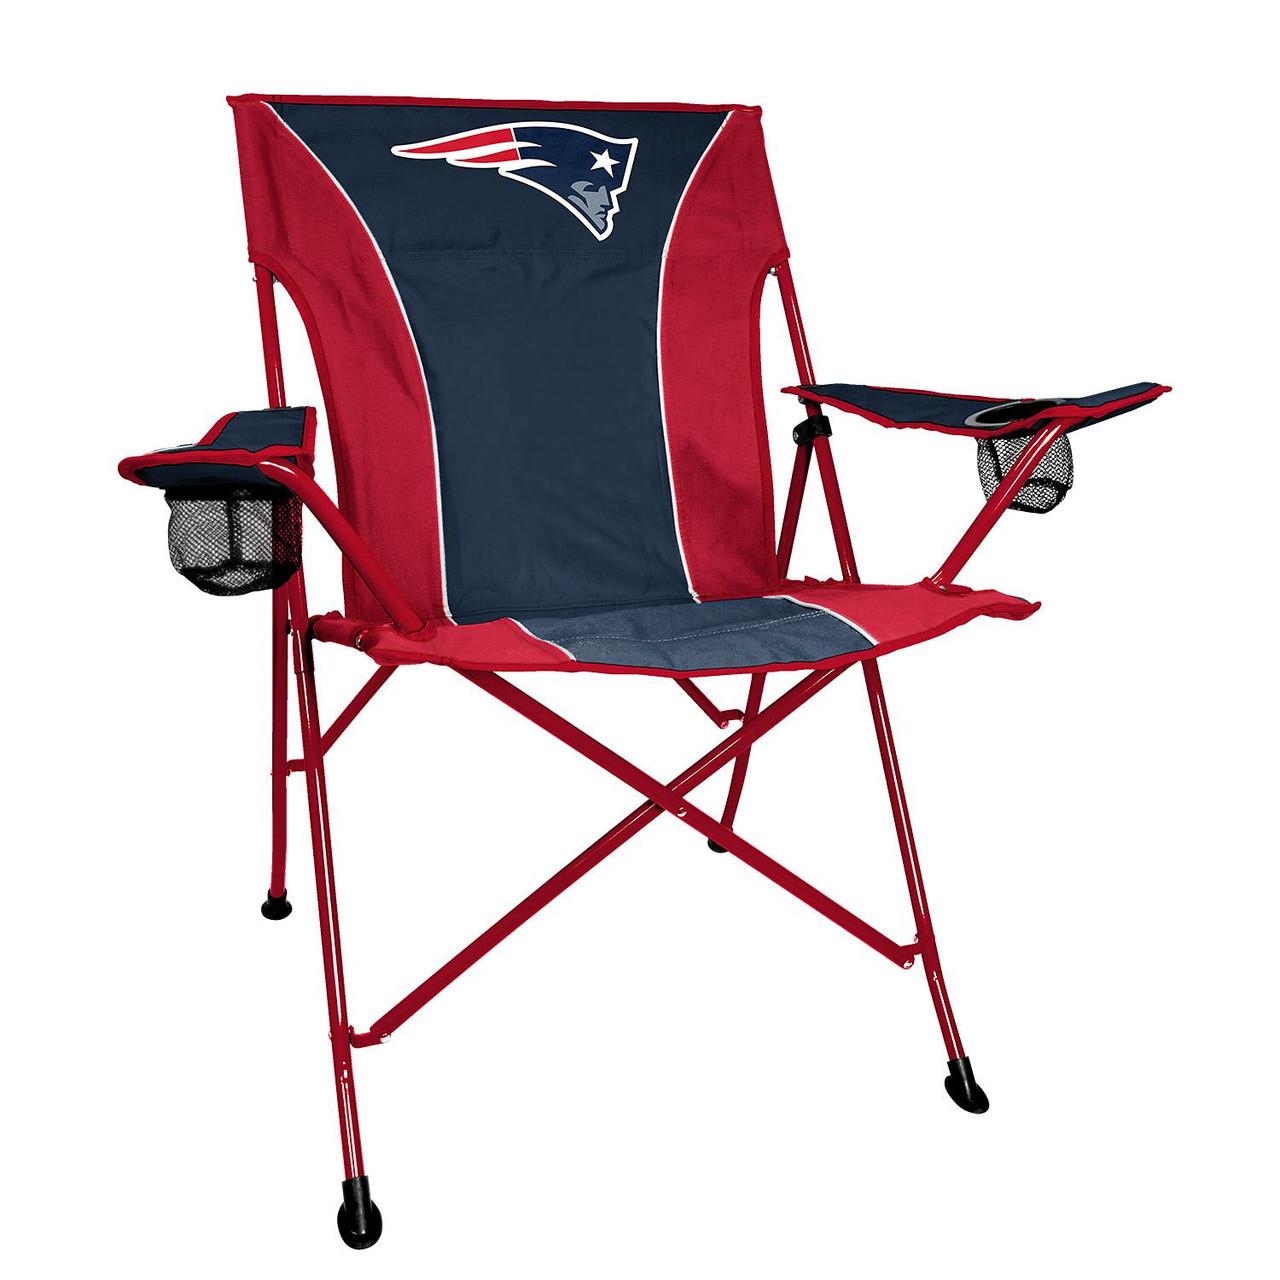 Surprising Nfl Patriots Deluxe Quad Chair Lamtechconsult Wood Chair Design Ideas Lamtechconsultcom